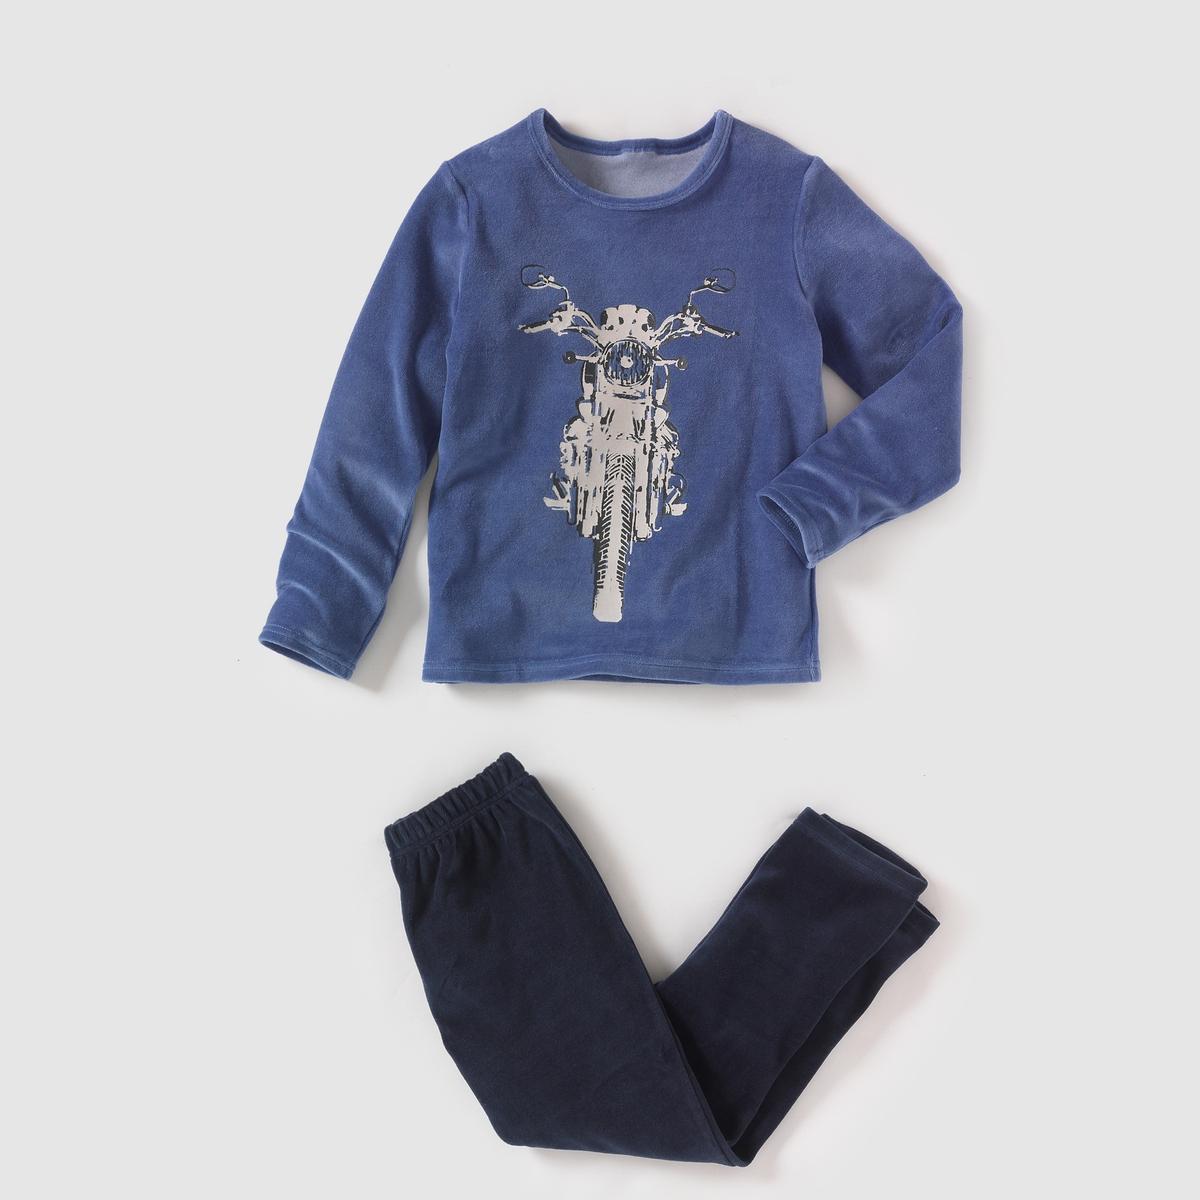 Пижама из велюра с рисунком, 2-12 лет